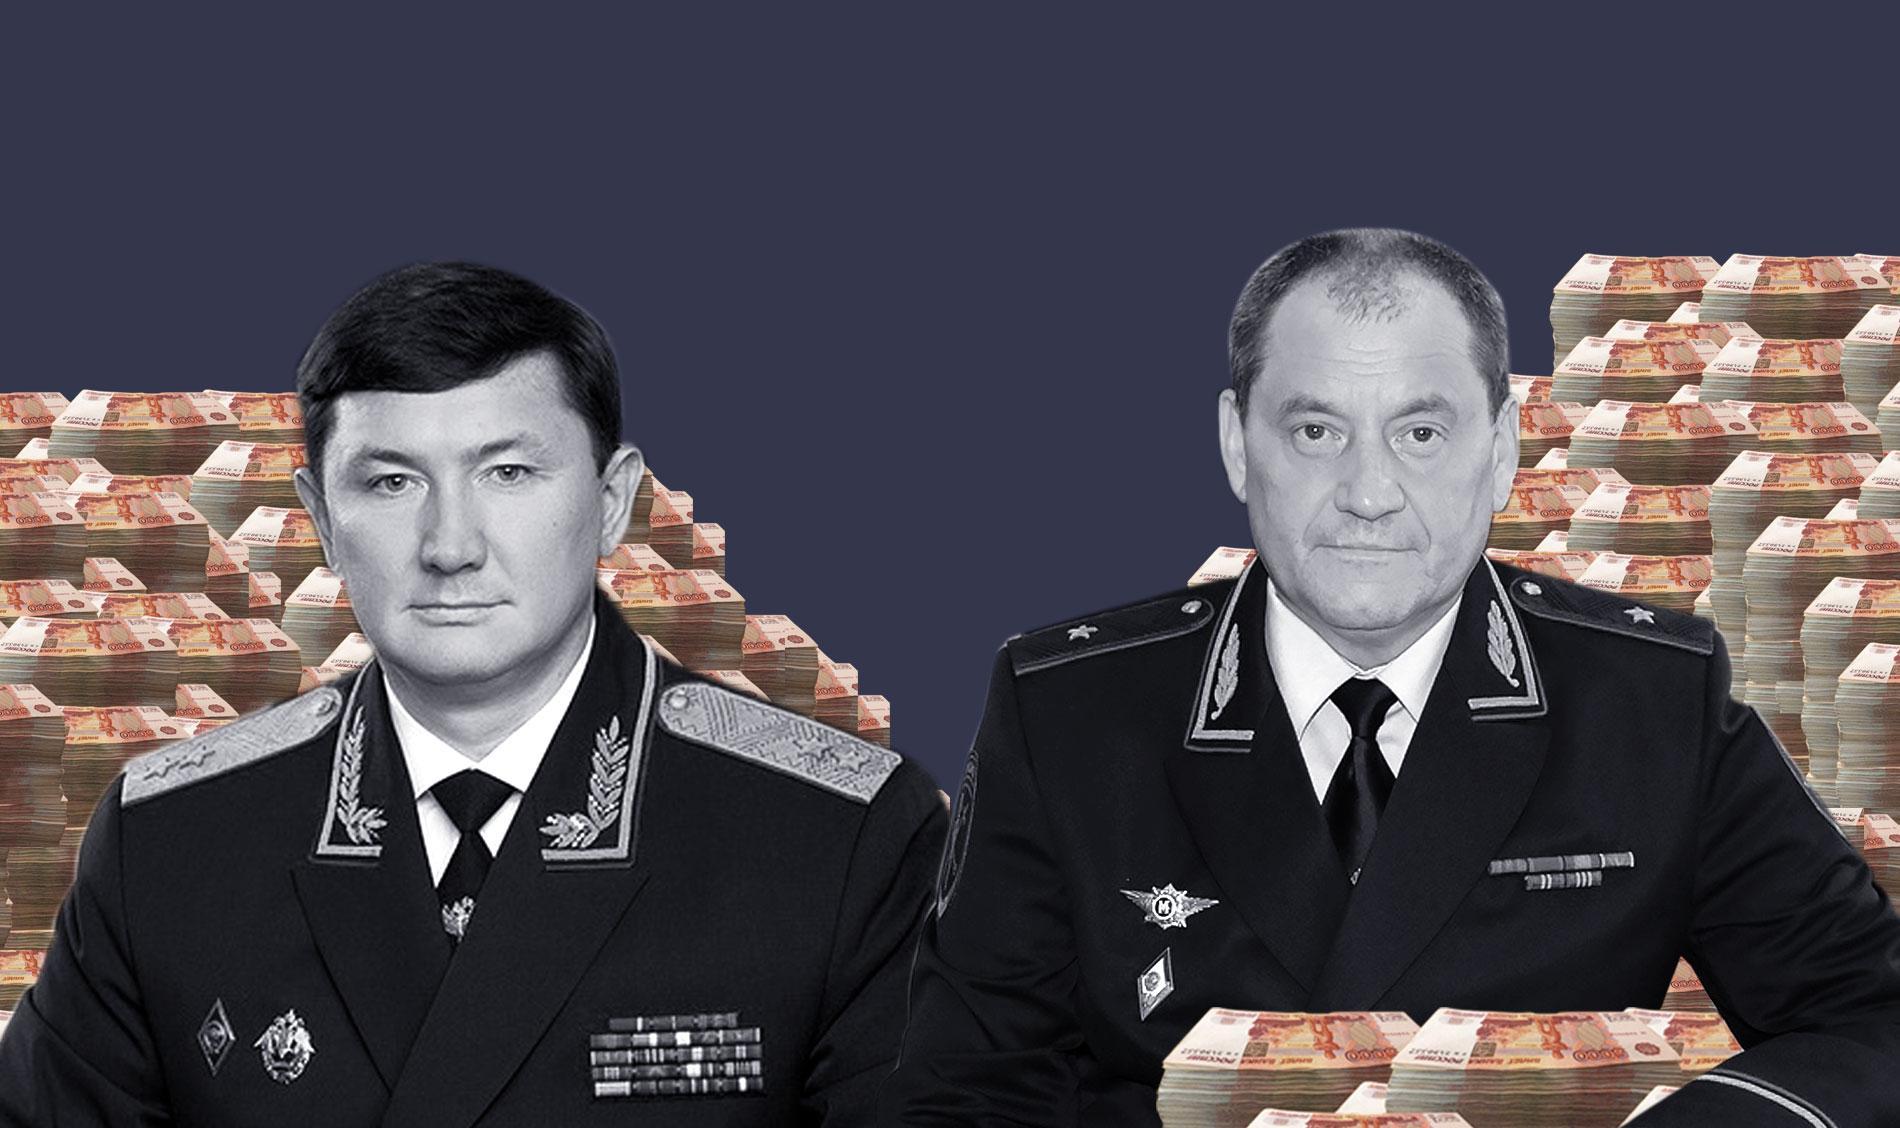 "<p>Коллаж ©LIFE. Фото © 11.мвд.рф © <a href=""http://pravdapfo.ru/news/95163-zaderzhan-byvshiy-glava-ufskn-chuvashii"" target=""_blank"" rel=""noopener noreferrer"">pravdapfo.ru</a></p>"